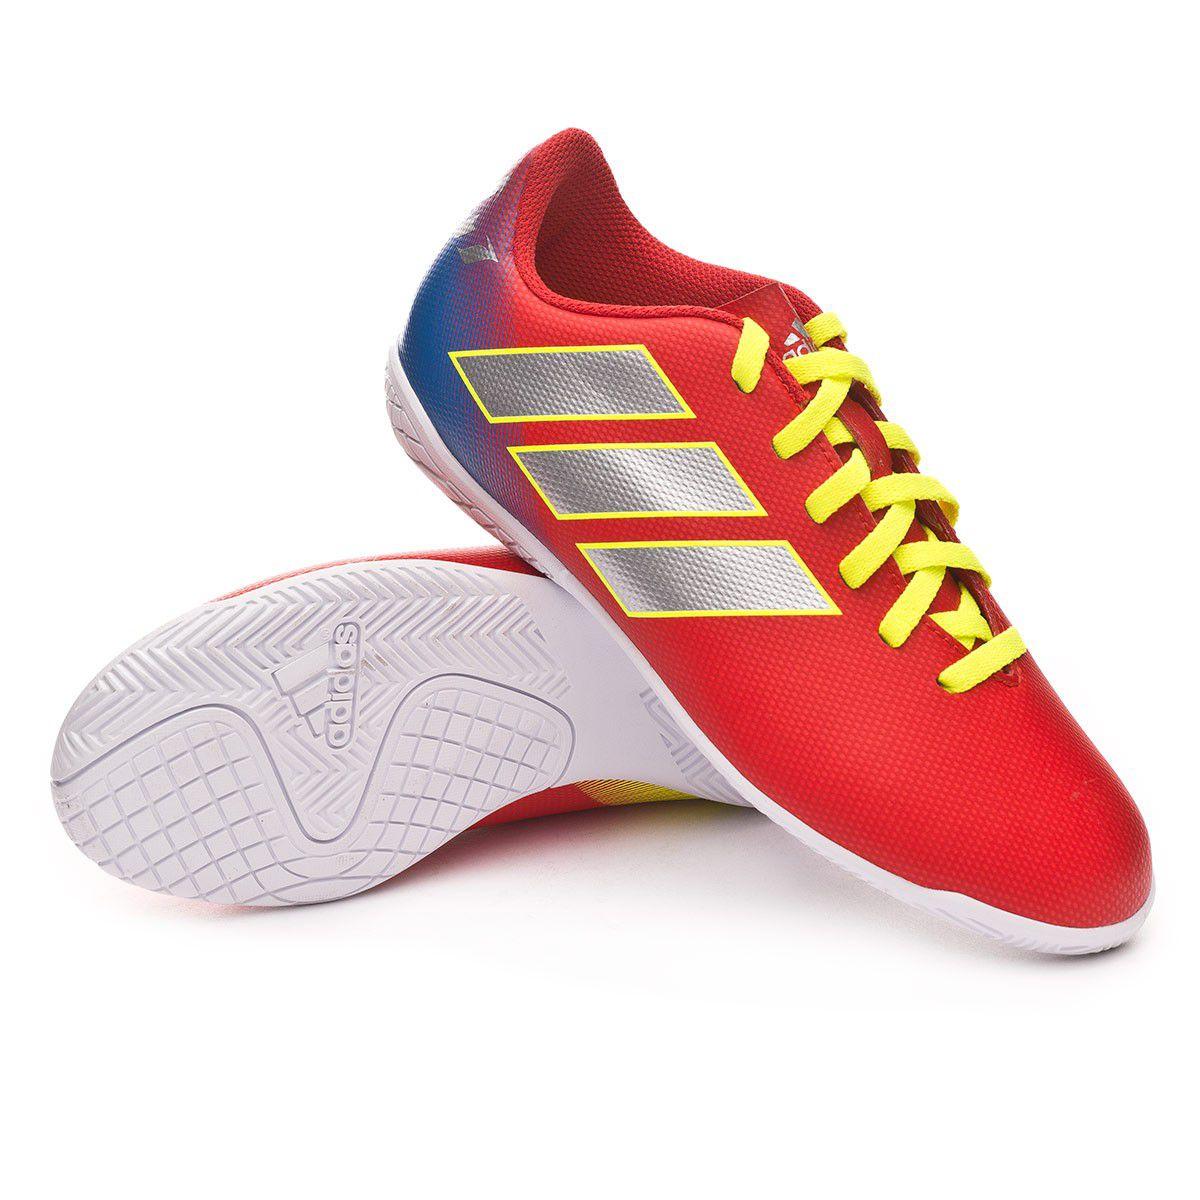 Chuteira Adidas Nemeziz Messi Tango 18.4 Futsal